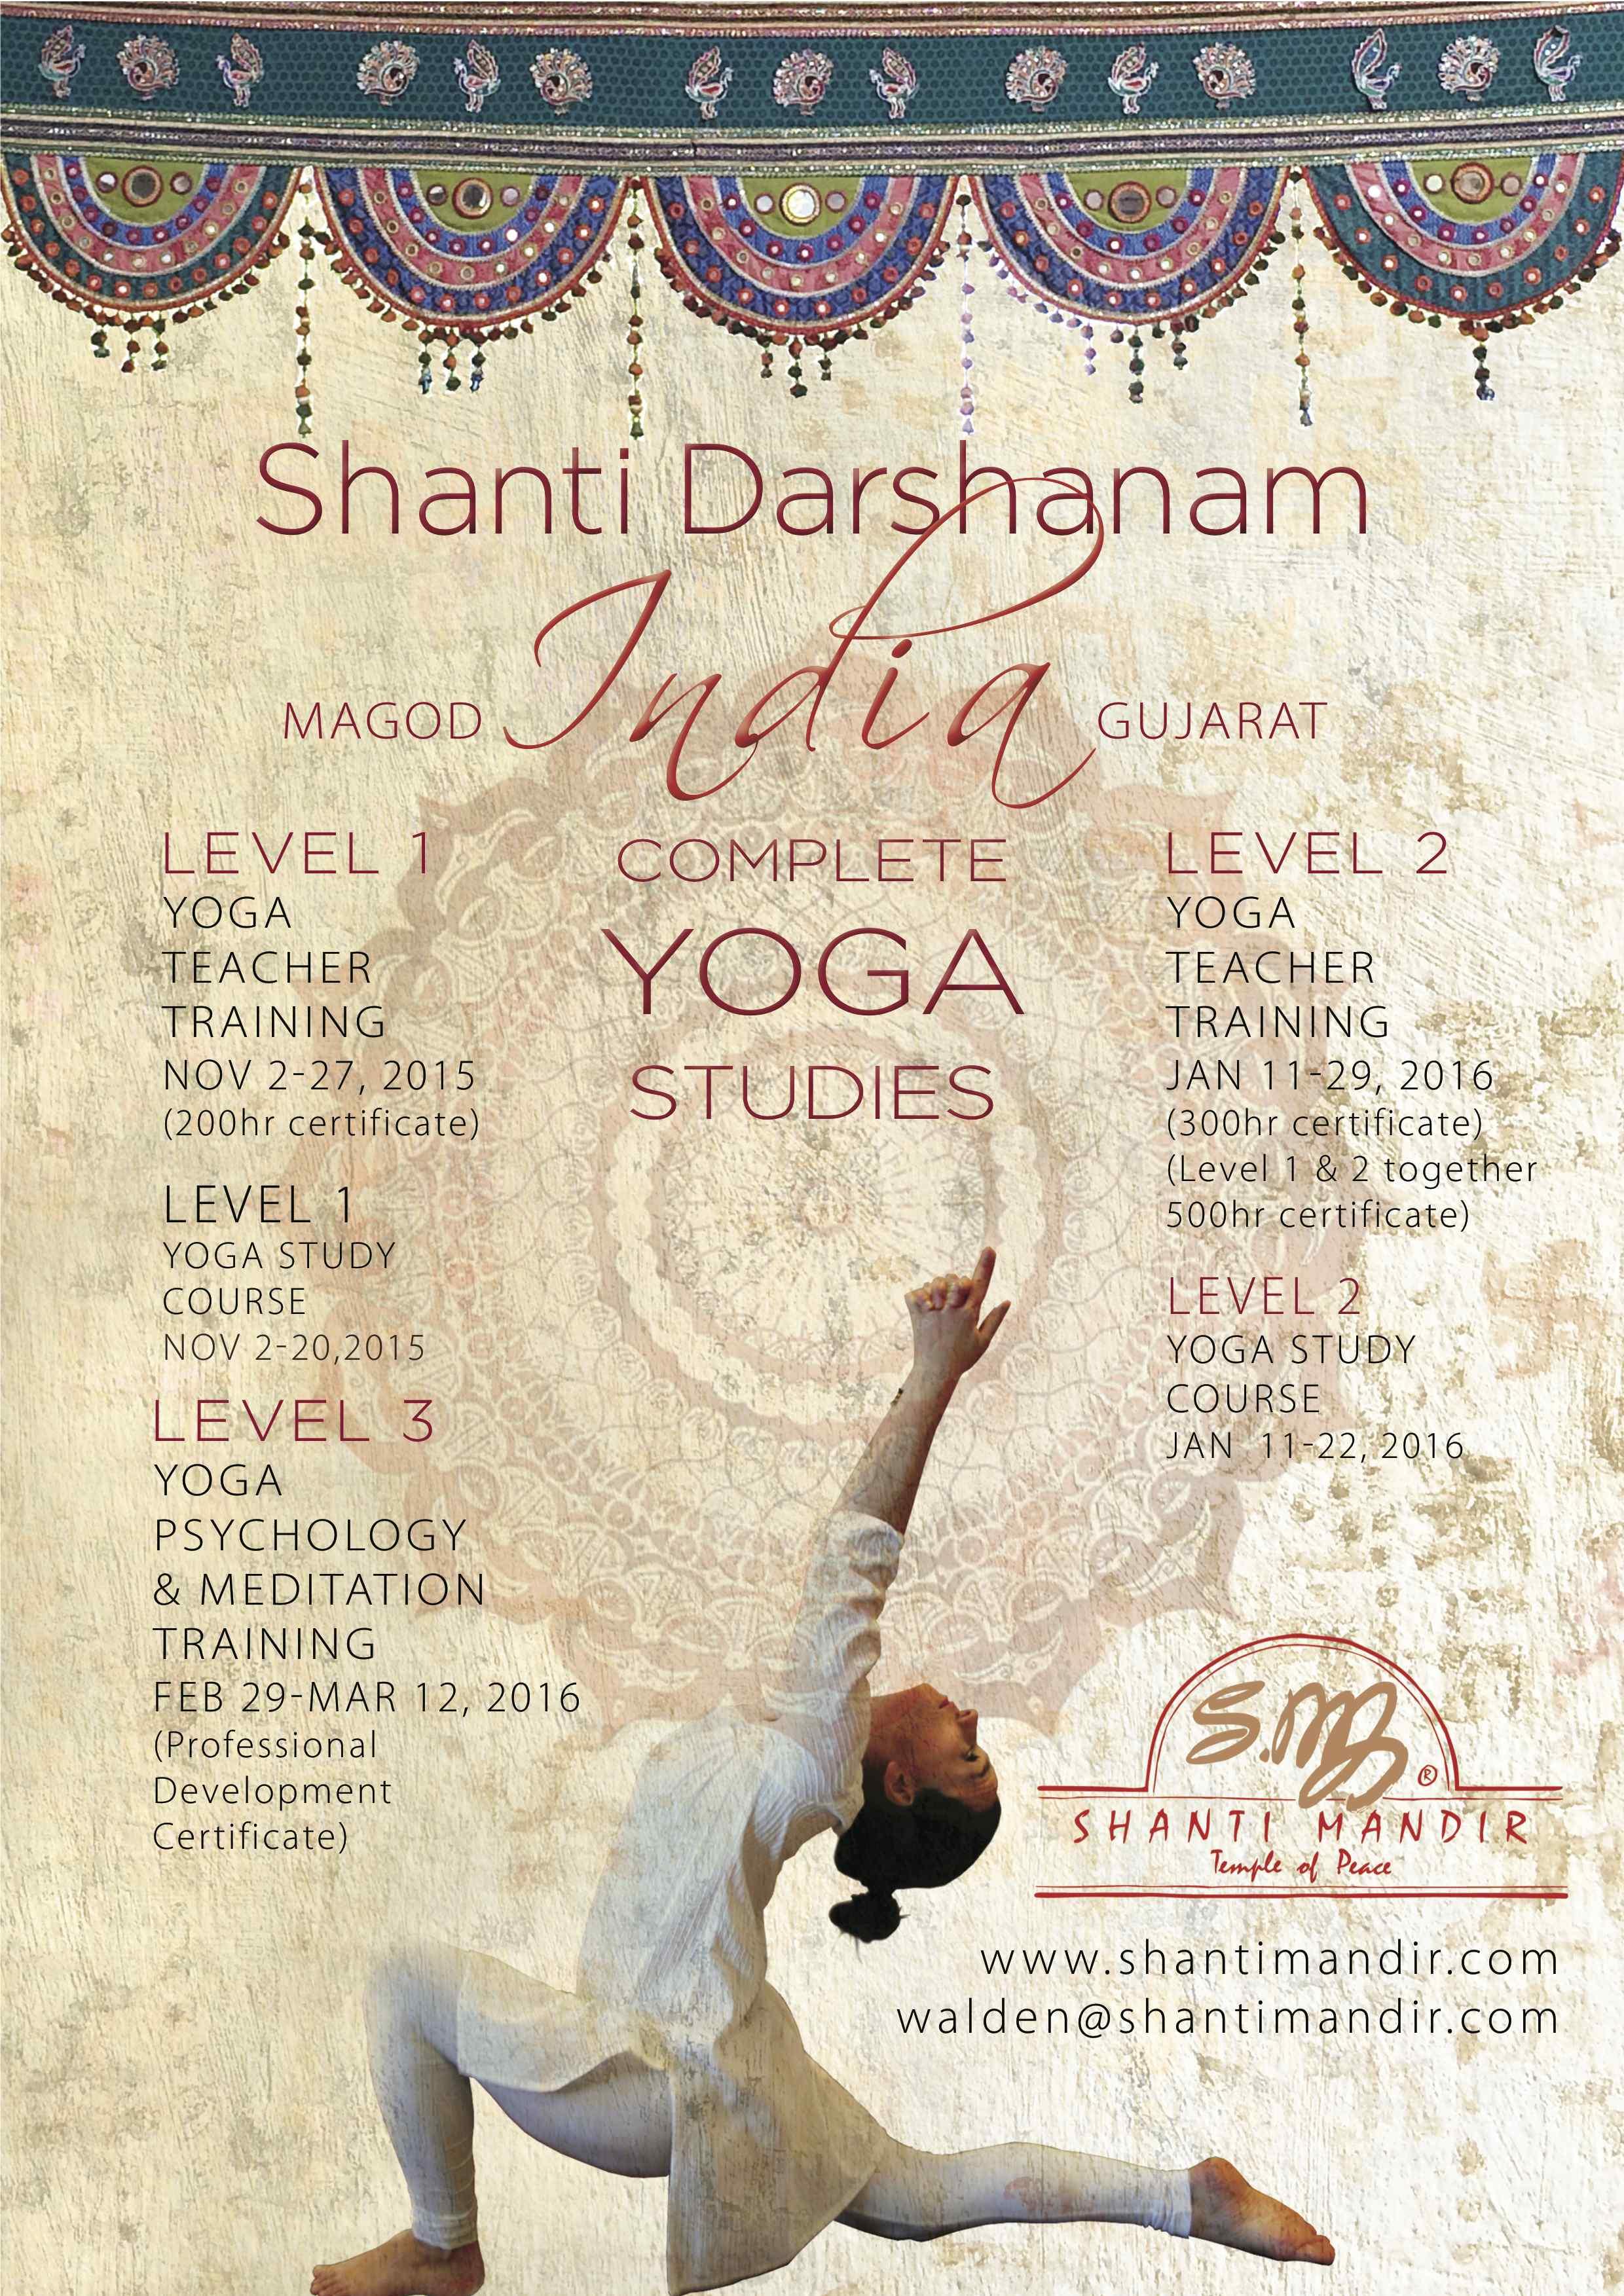 200 hour Level 1 Certificate-Shanti Mandir